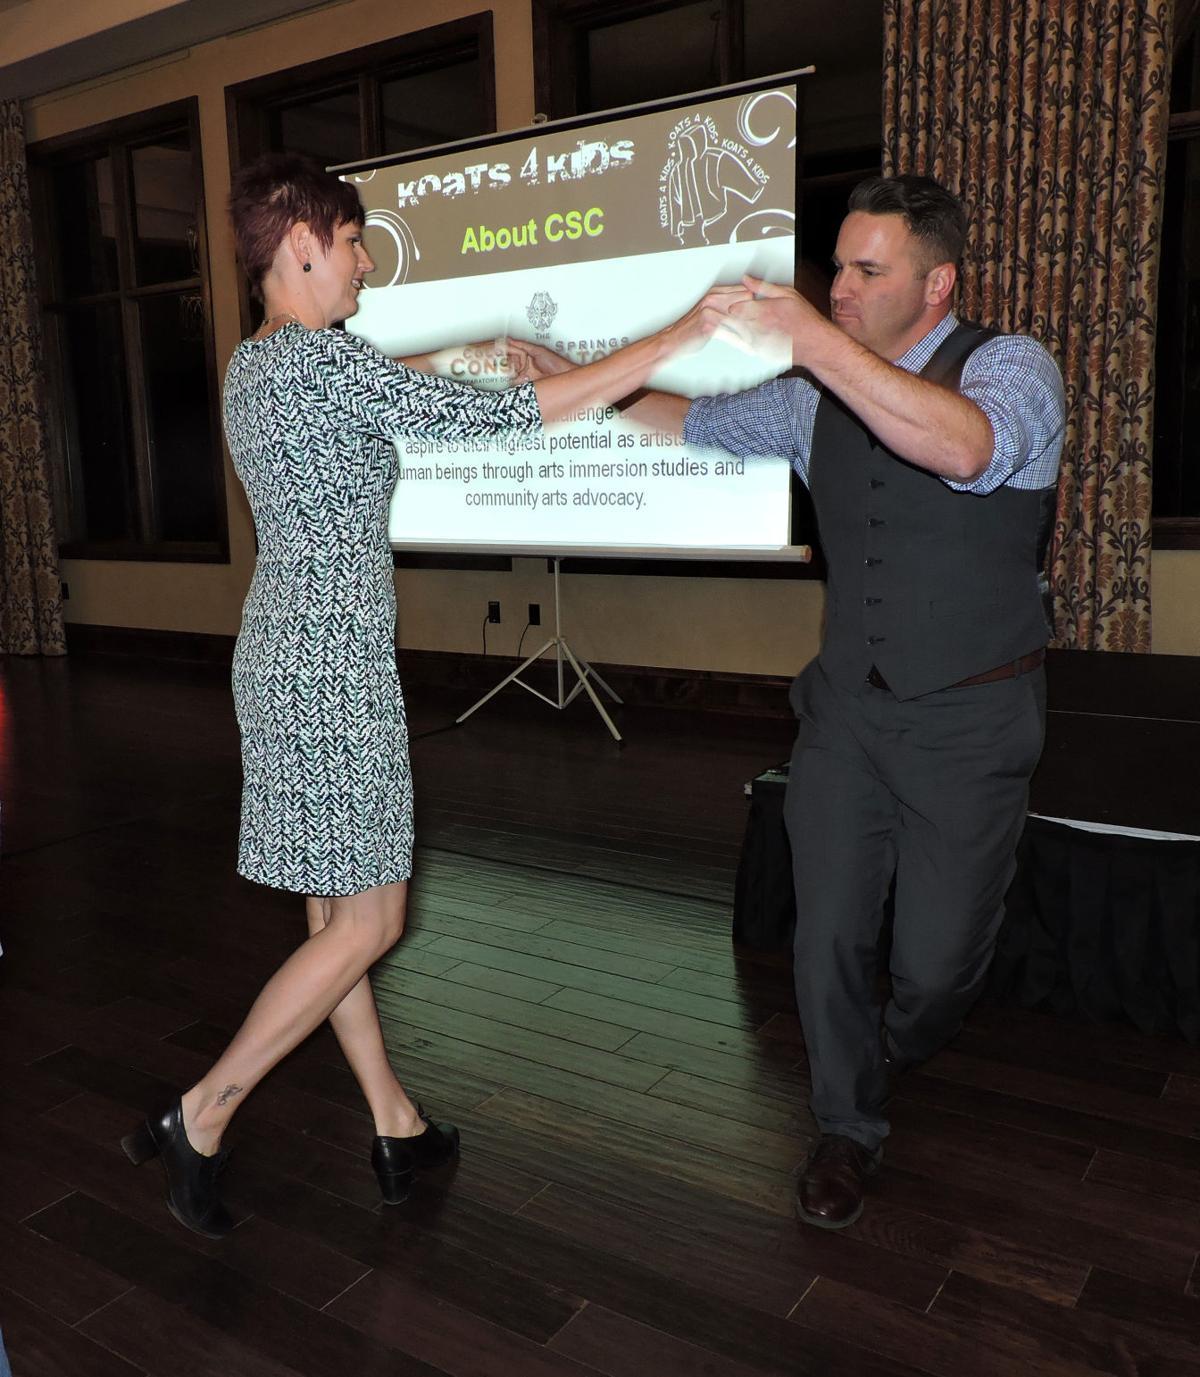 Heather and Robert Bishop took to the dance floor at Koats 4 Kids. 102116 Photo by Linda Navarro